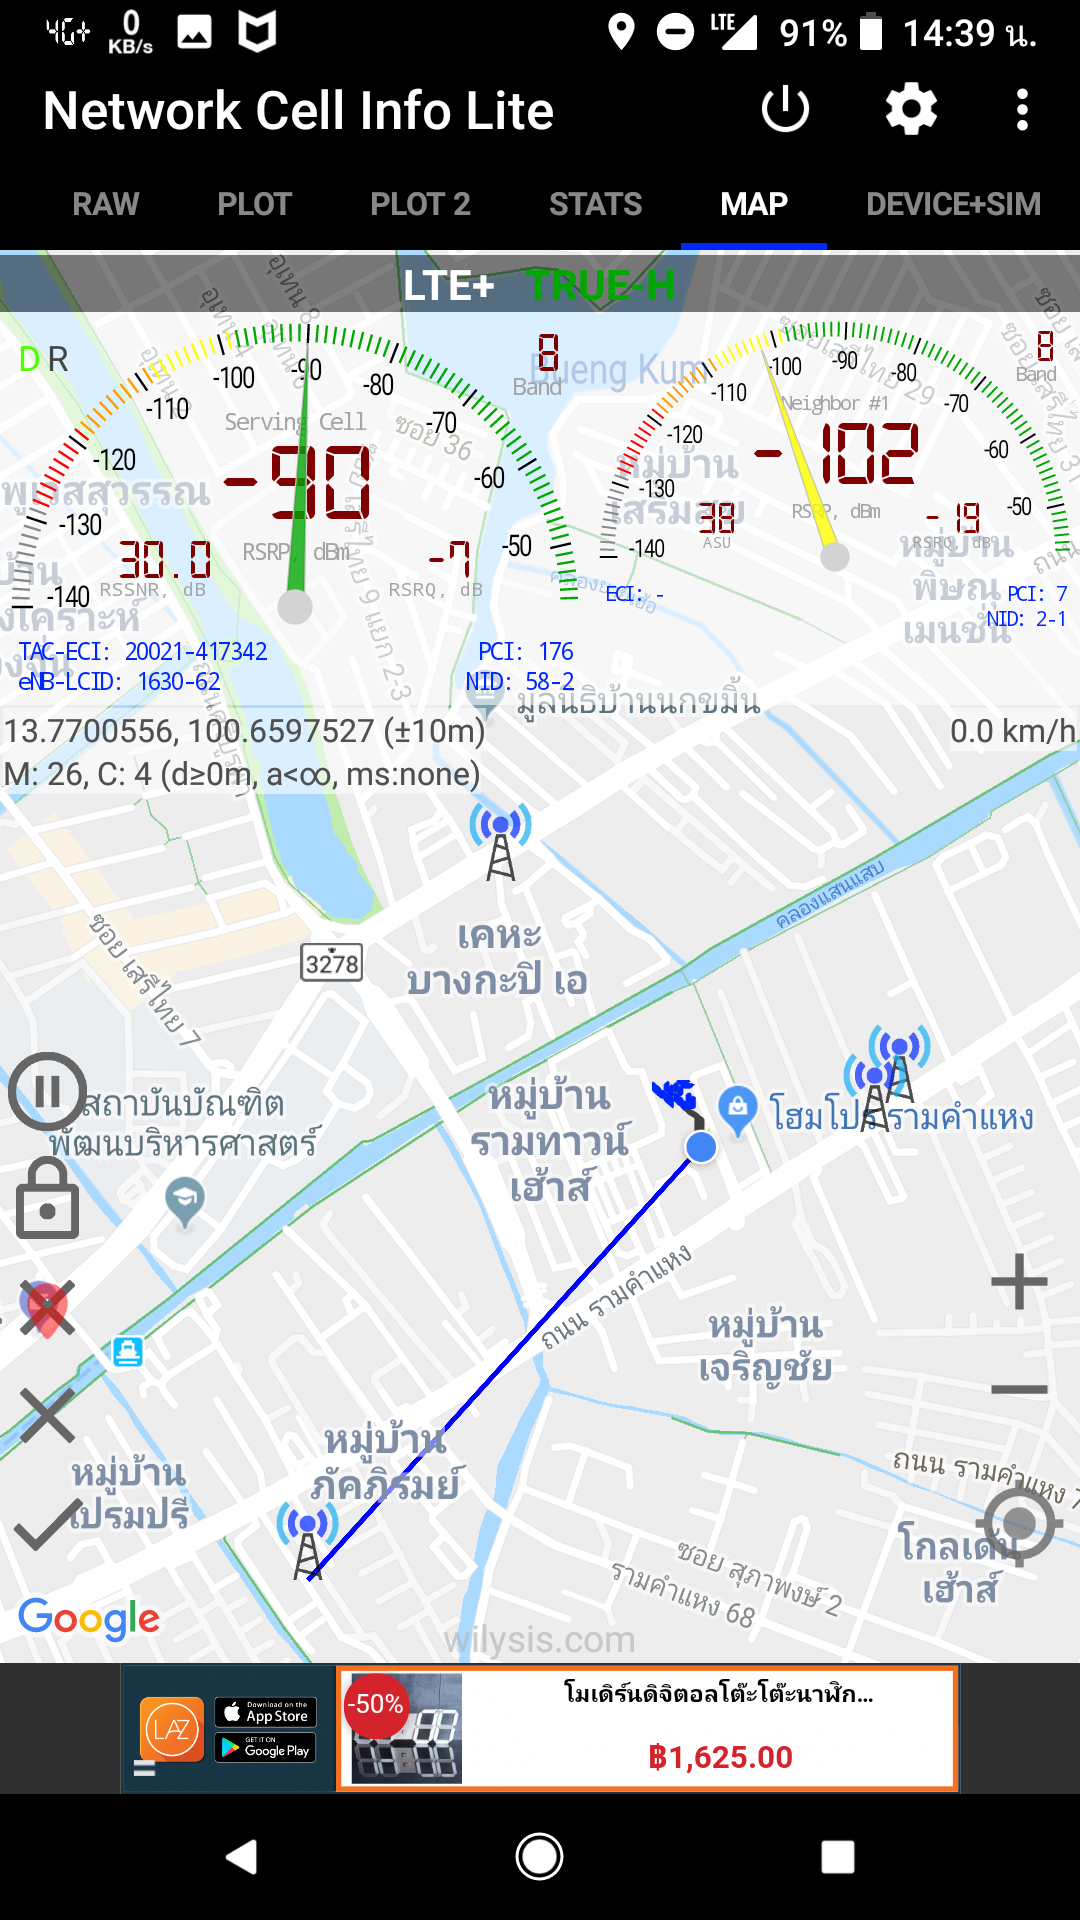 Network Cell Info Lite (7)